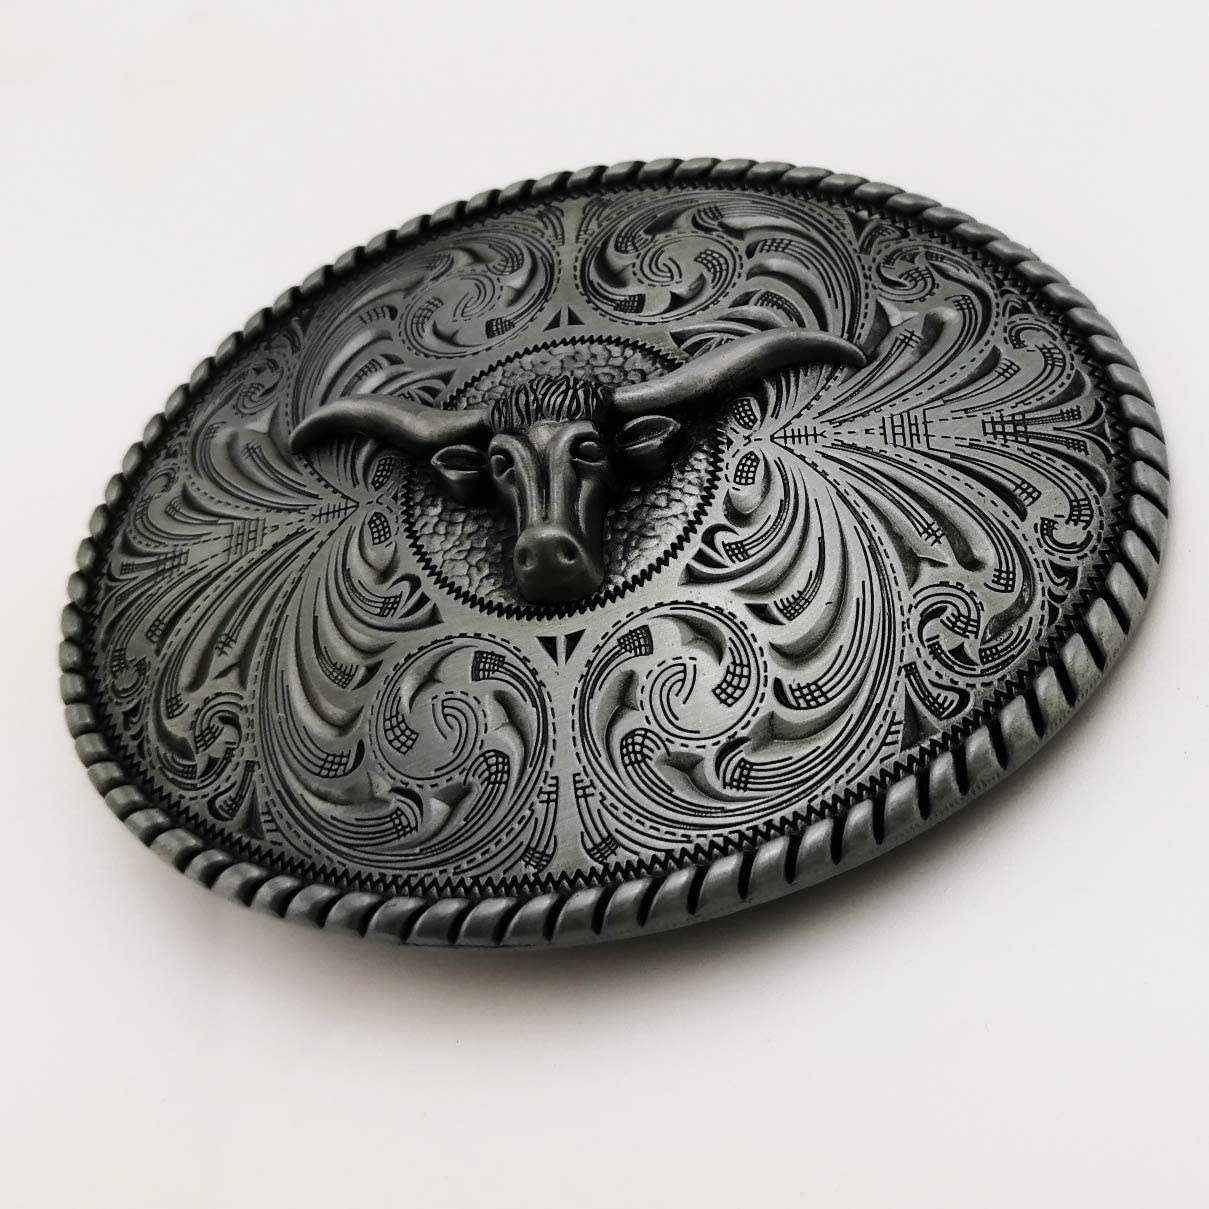 Retro Vintage Classic Men/'s Belt Buckle Metal Alloy Western Cowboy New Design BB